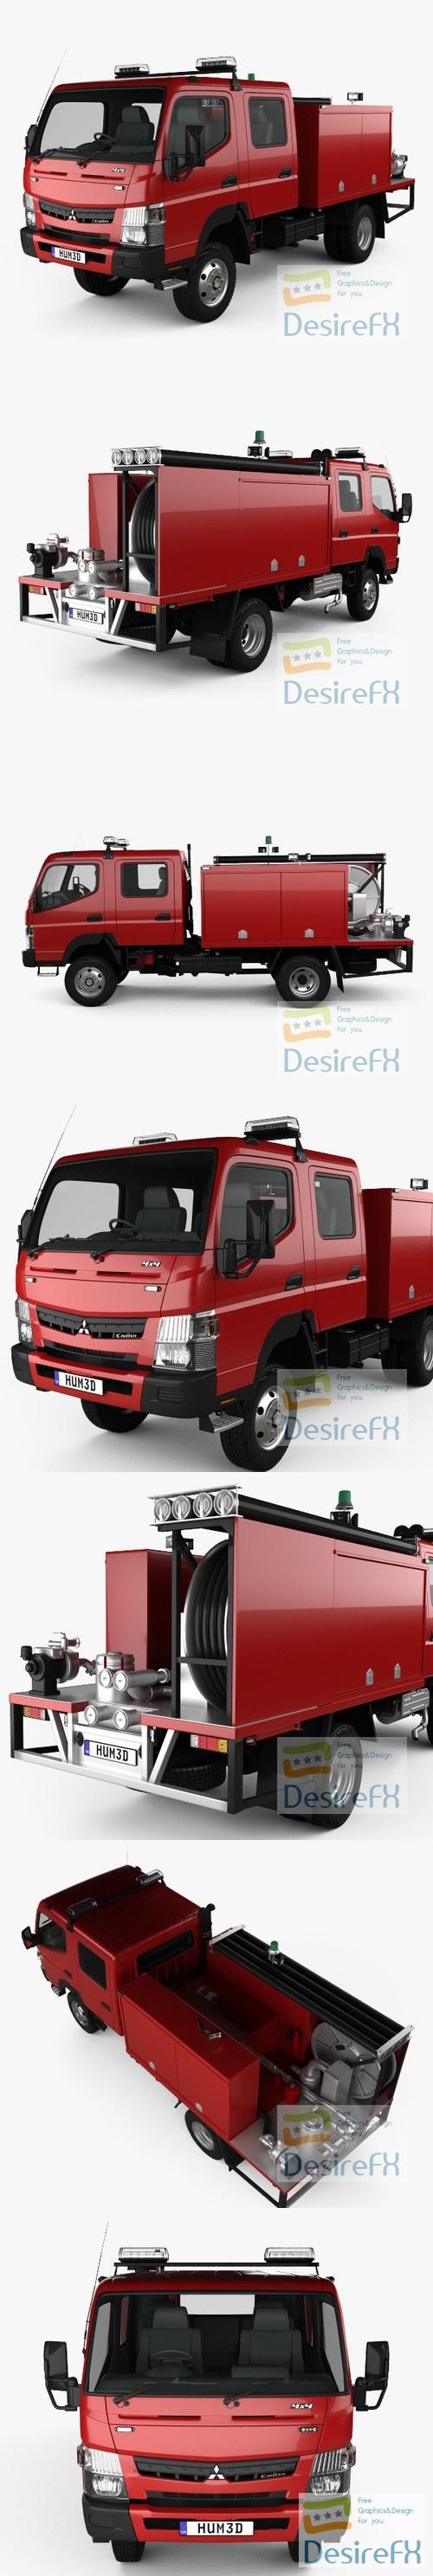 Mitsubishi Fuso Canter Wide Crew Cab Fire Truck 2016 3D Model